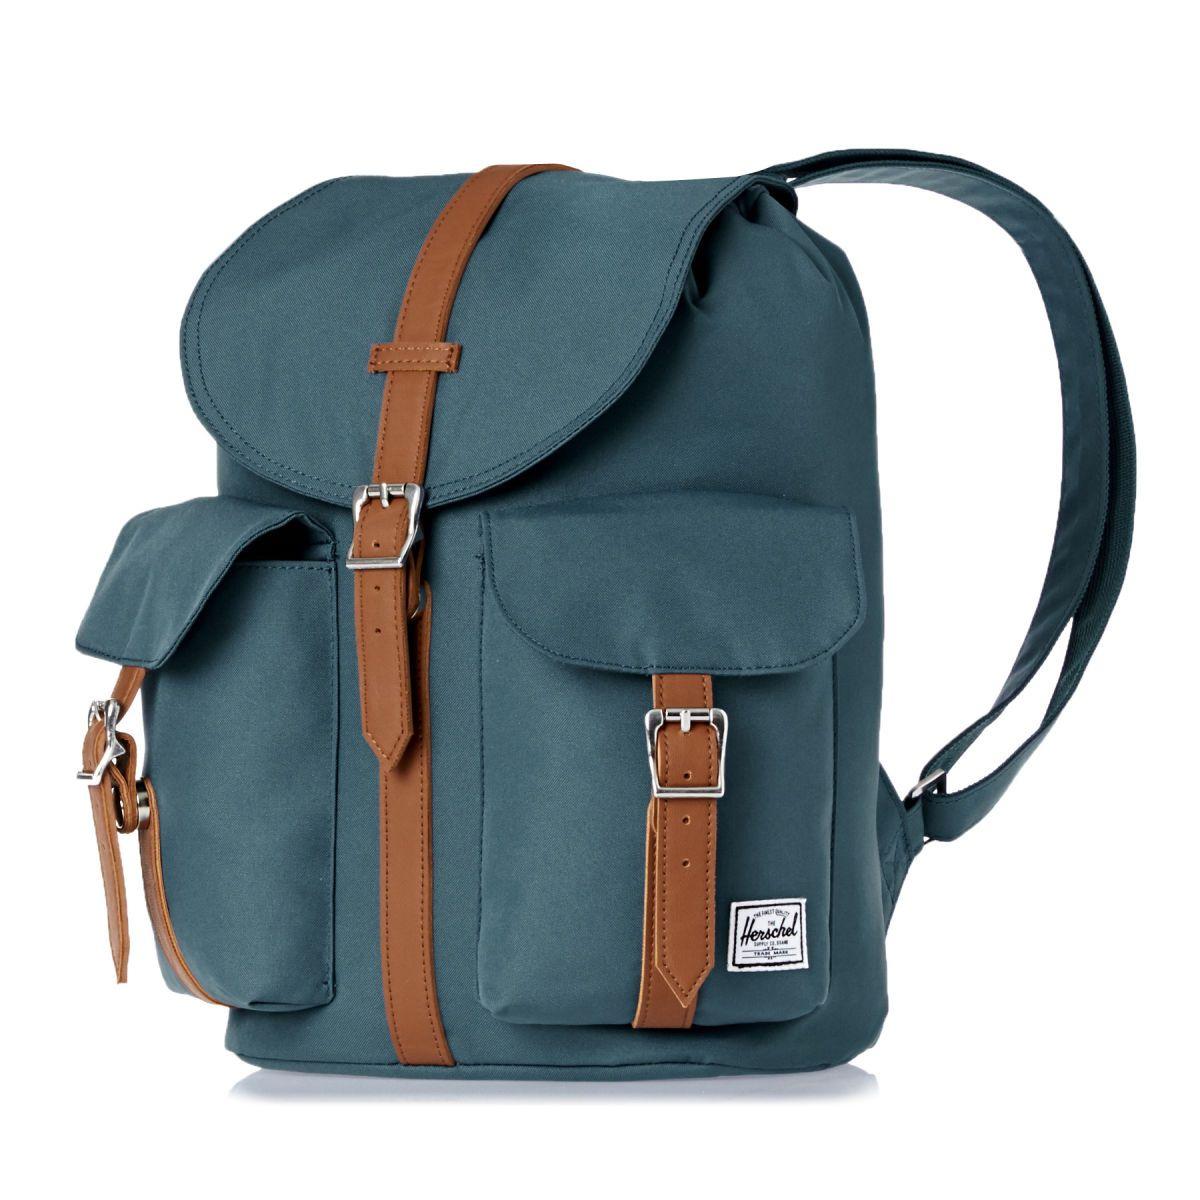 Herschel Dawson Womens Backpack - Indian Teal/Tan | Borsa ...